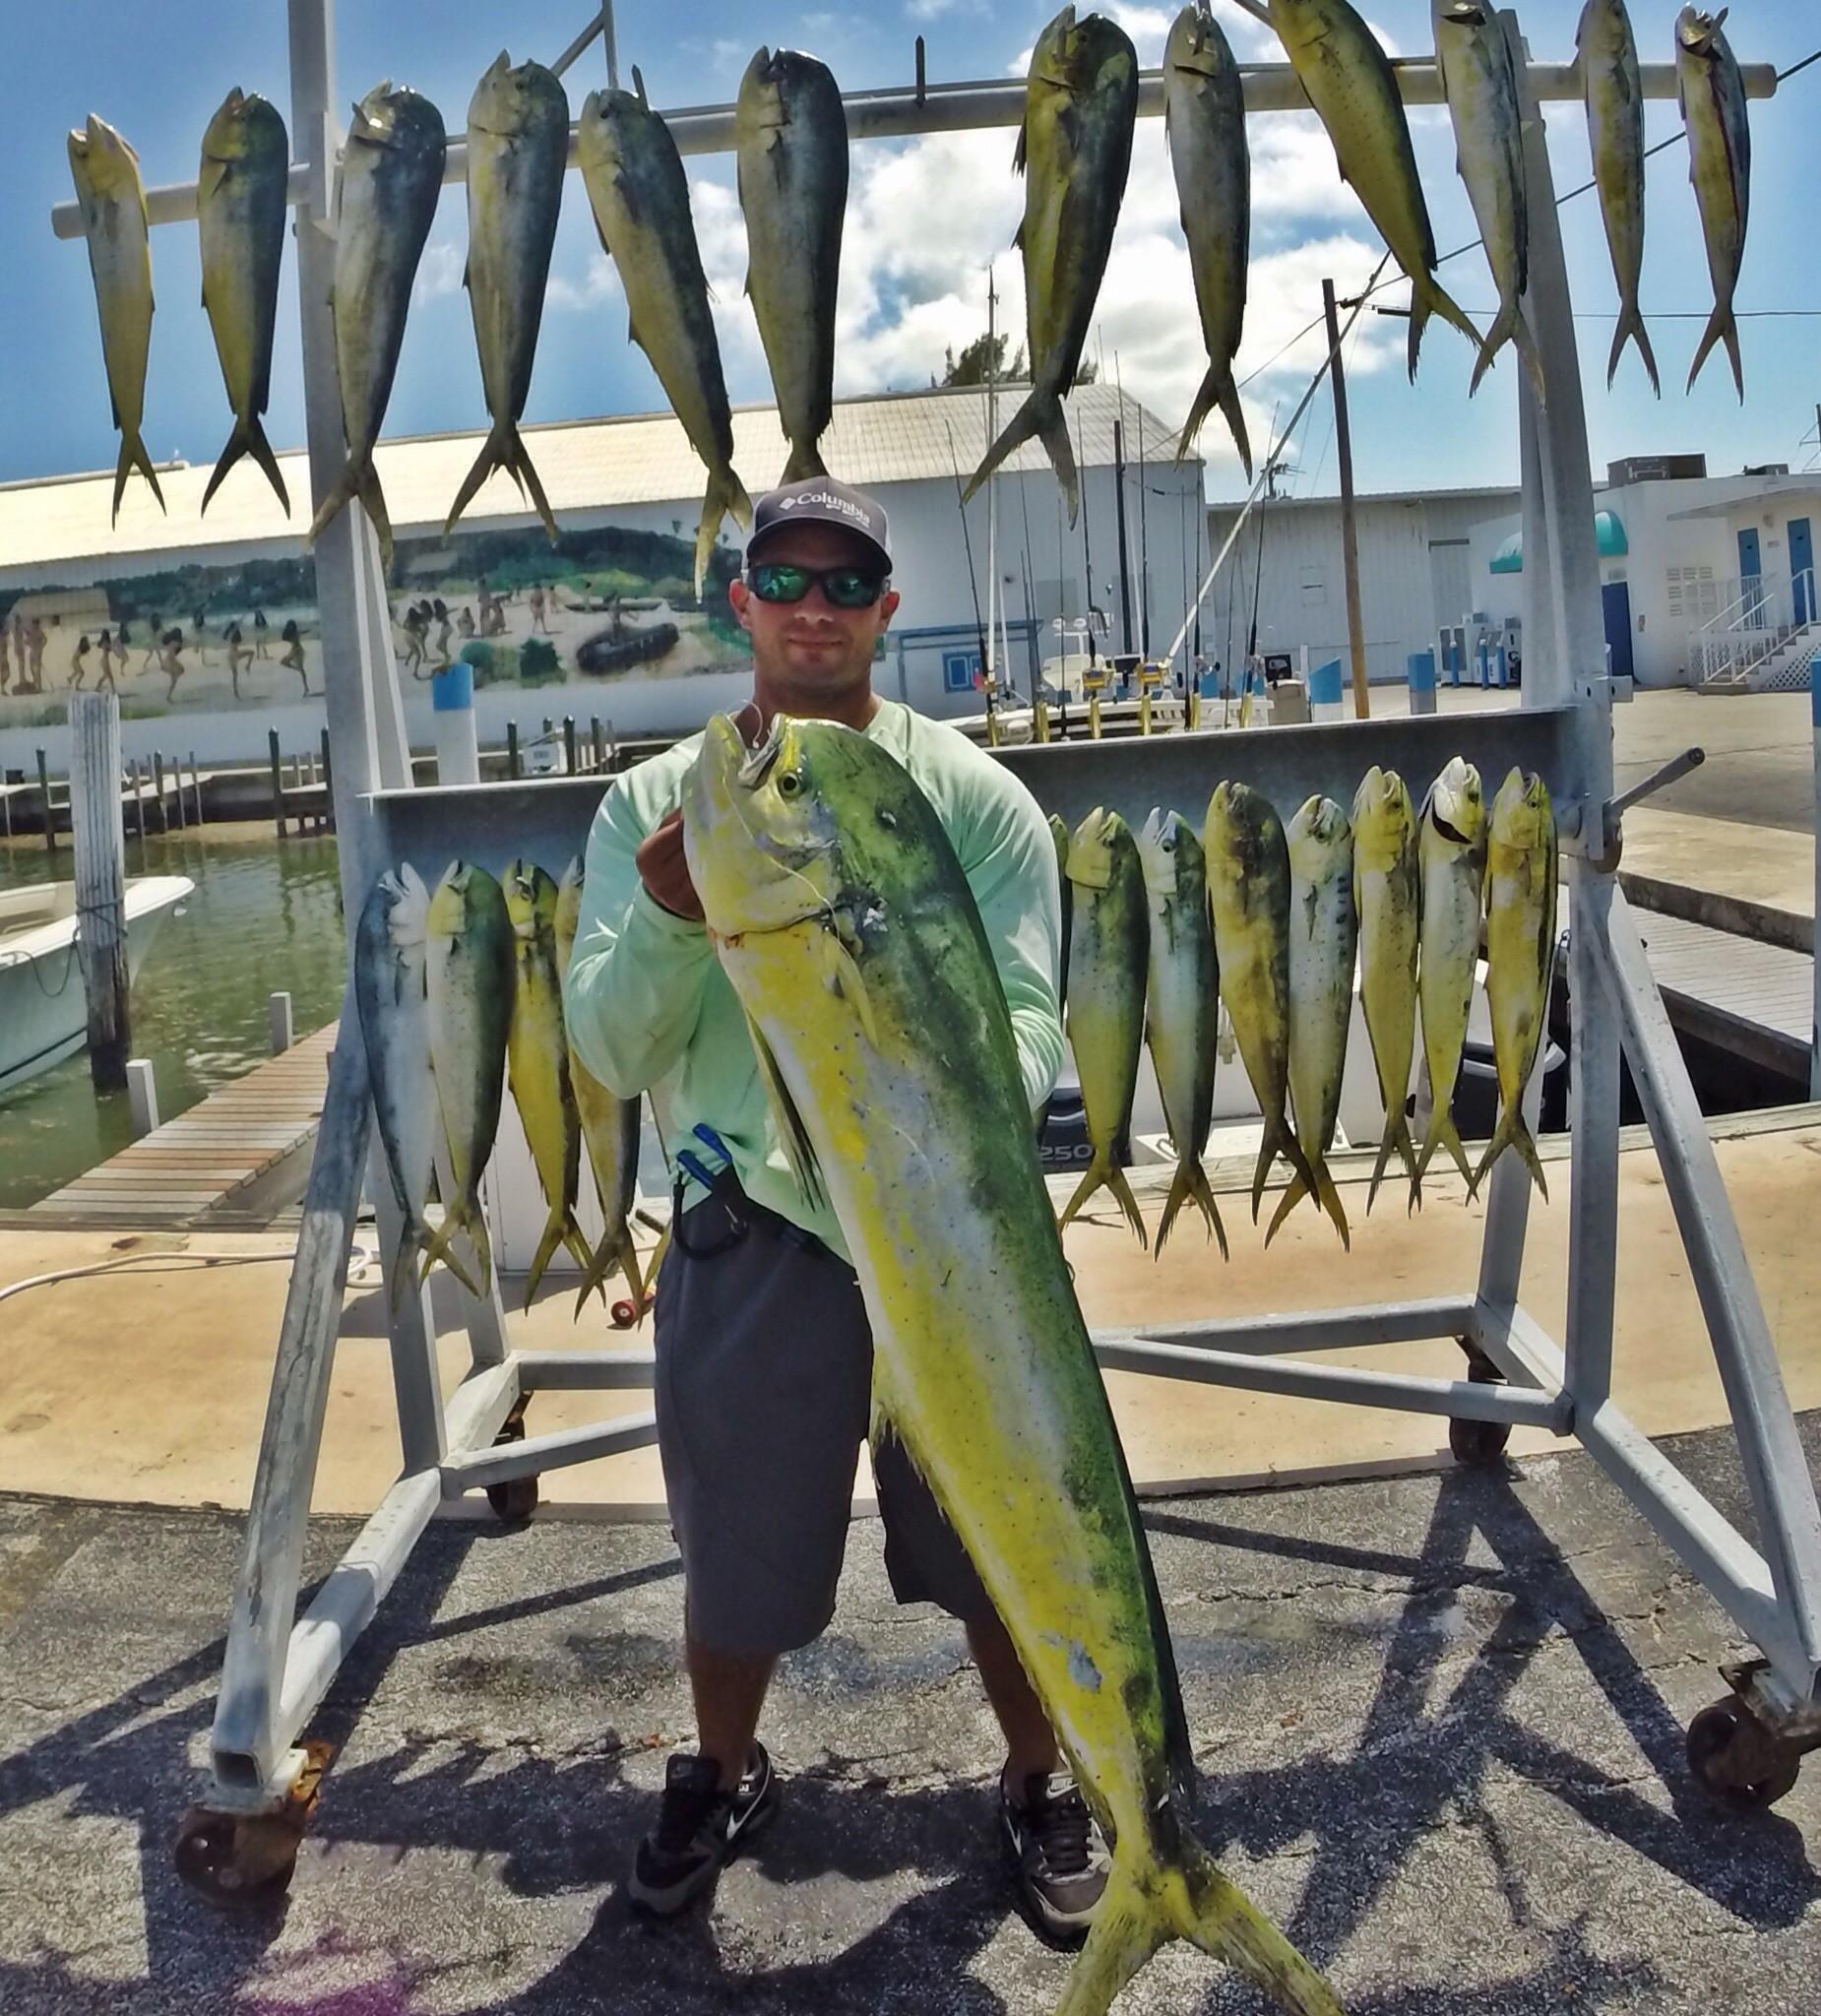 5 Star Sportfishing Charters: Reef  1/2 Day